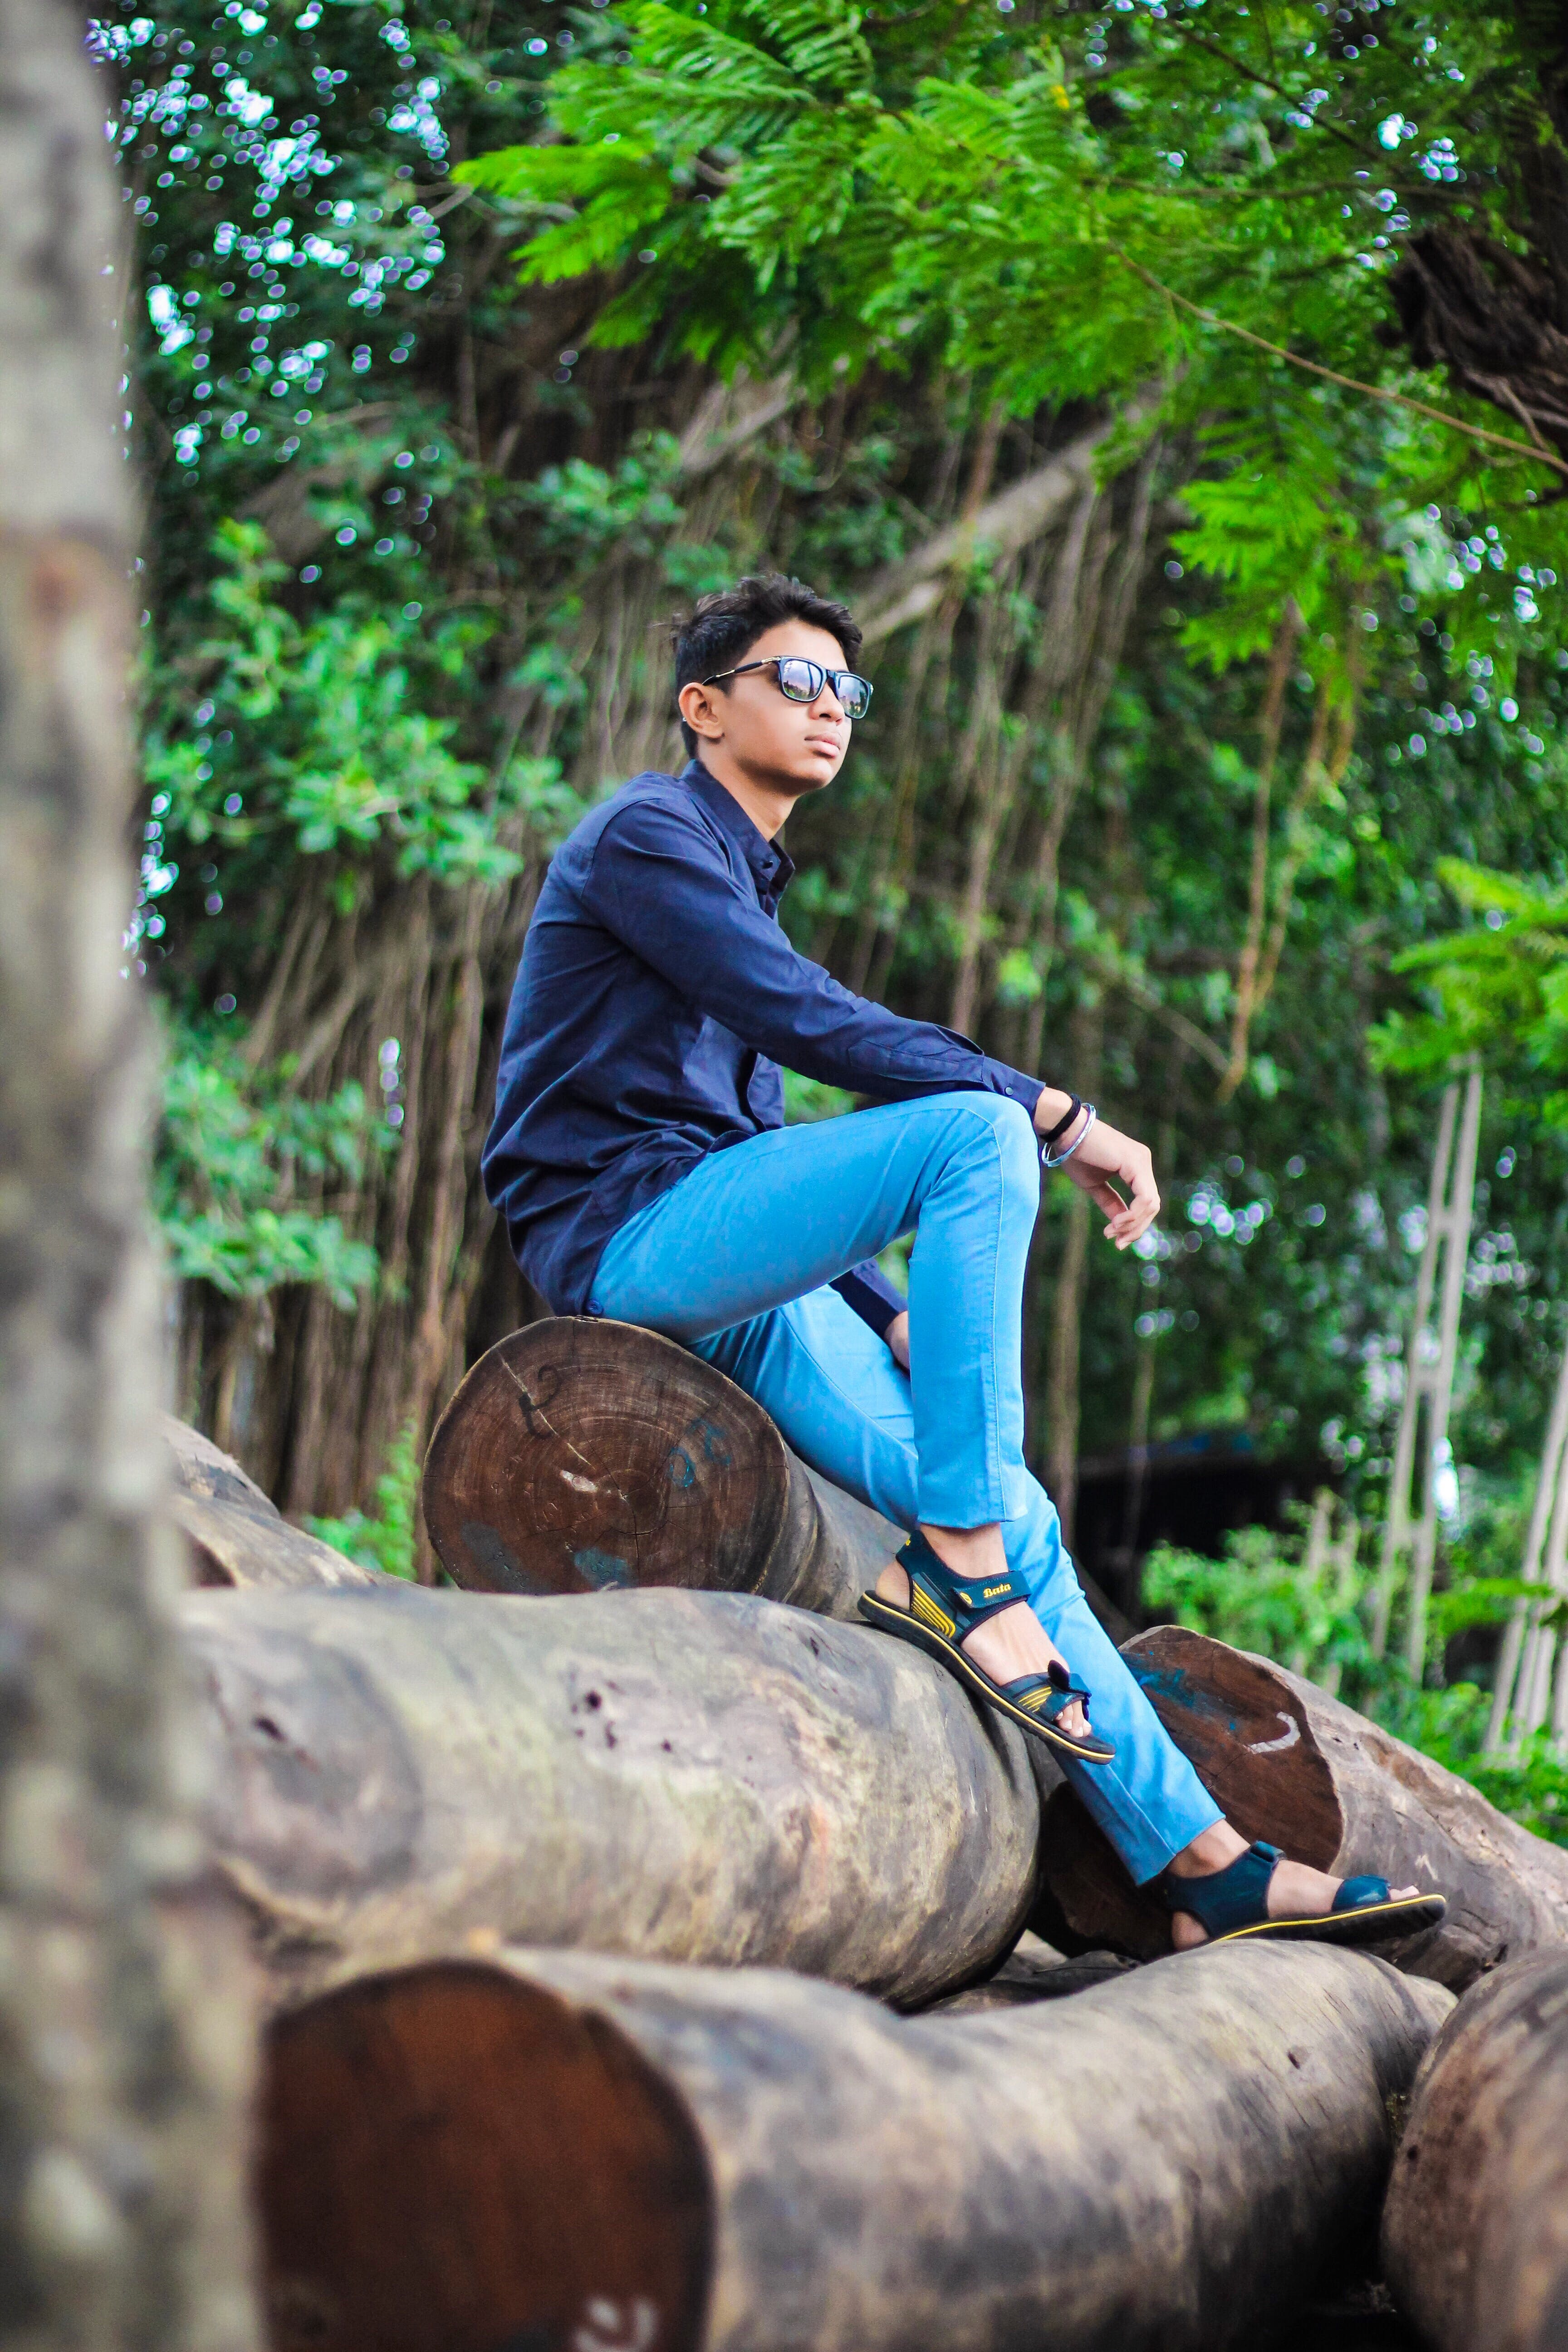 Fotos de stock gratuitas de chaval, diseñar, hombre, Moda